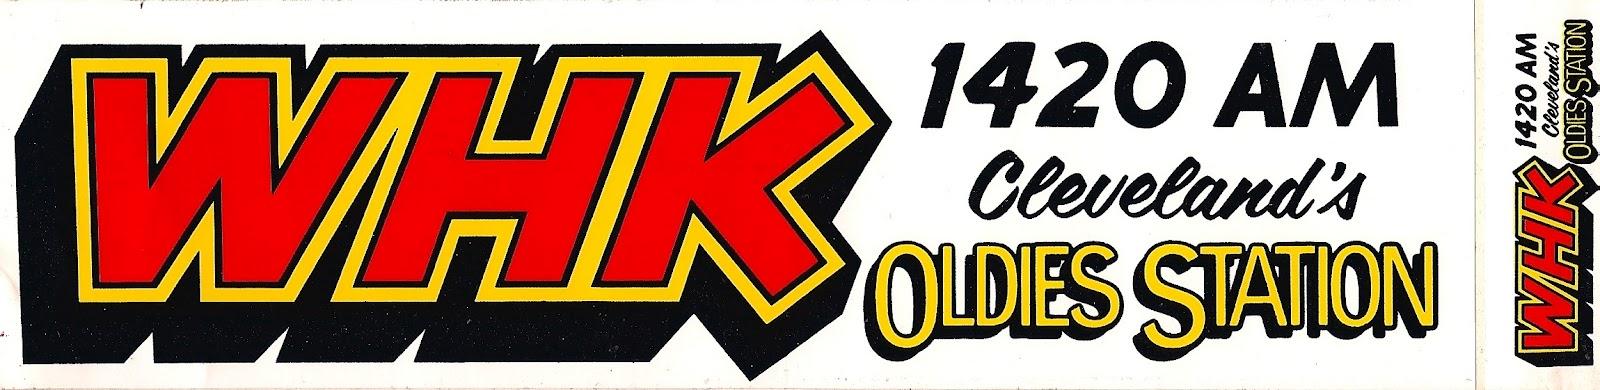 WHK-1420